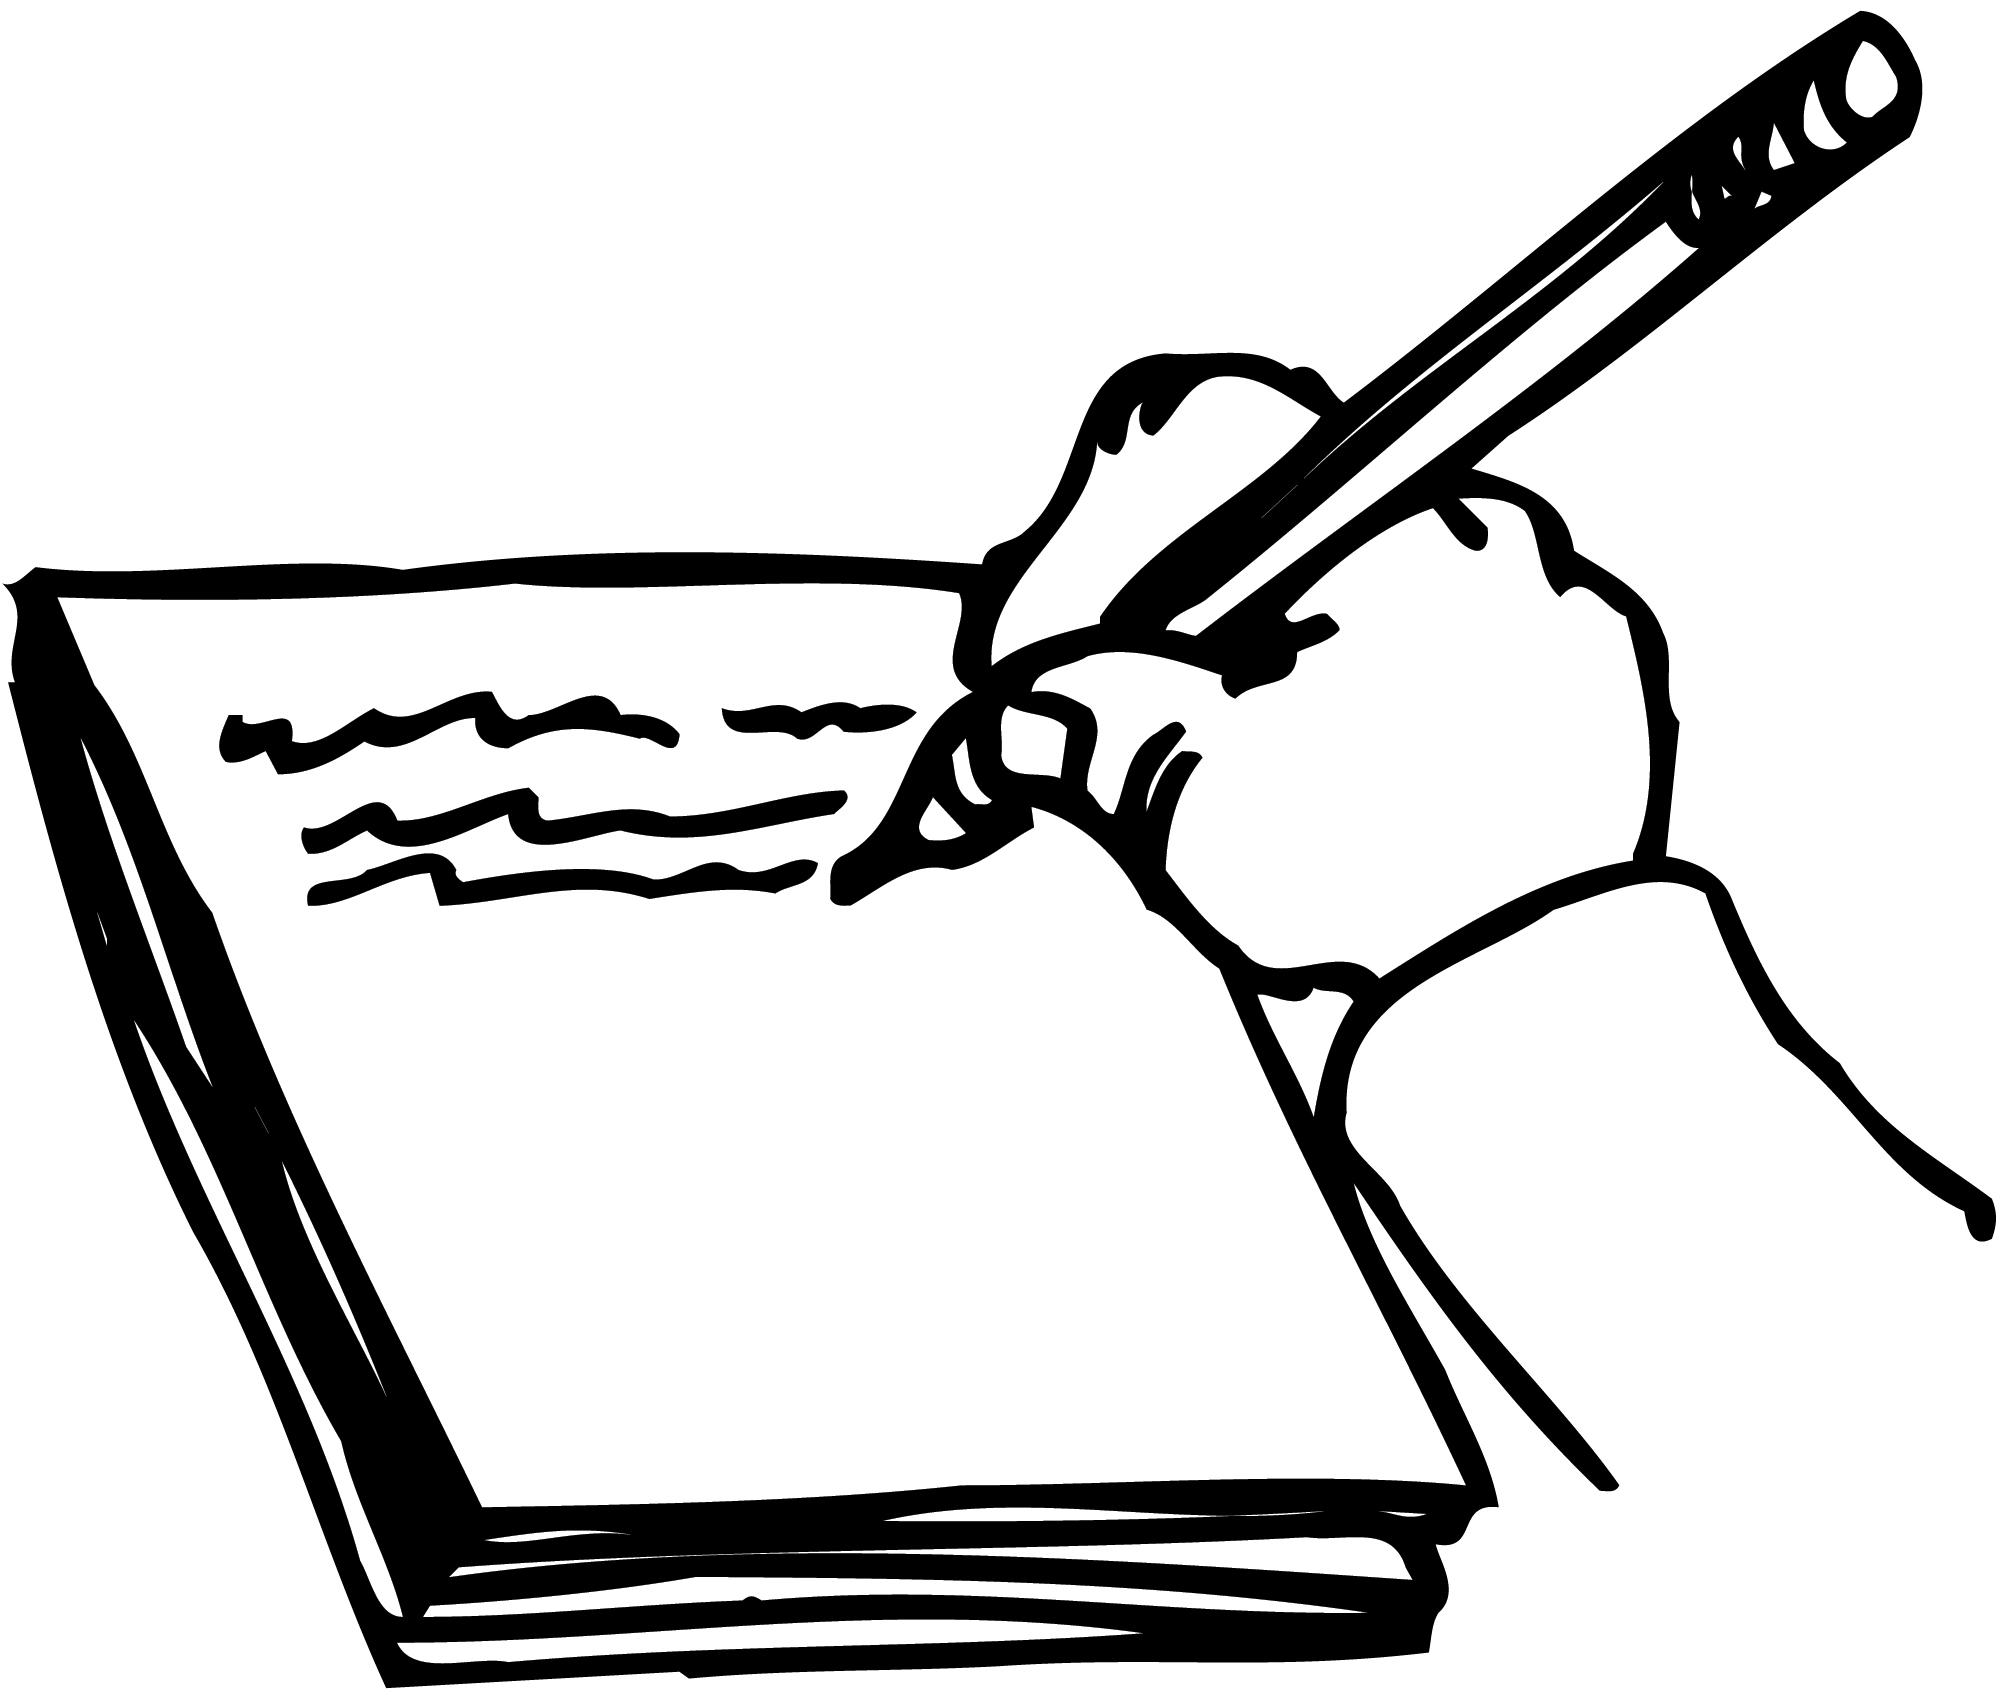 write 200 word description about your product by junaidkhaskheli